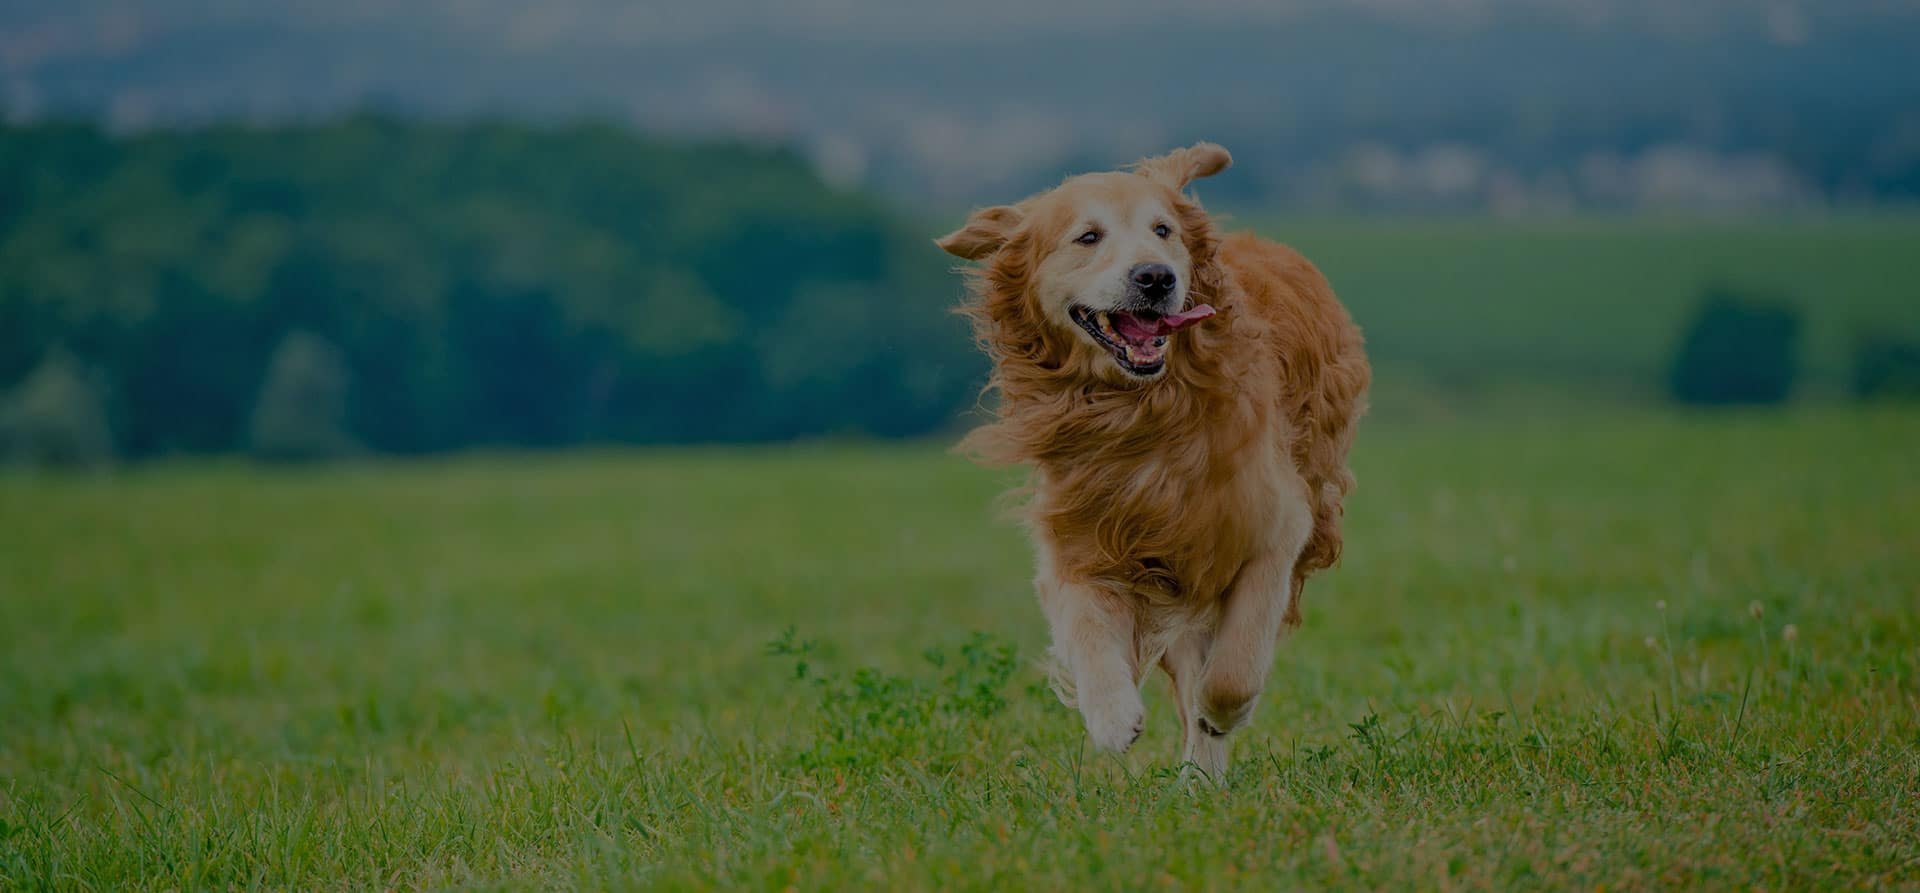 Copyright: gekaskr 123RF Stock Photo dog running